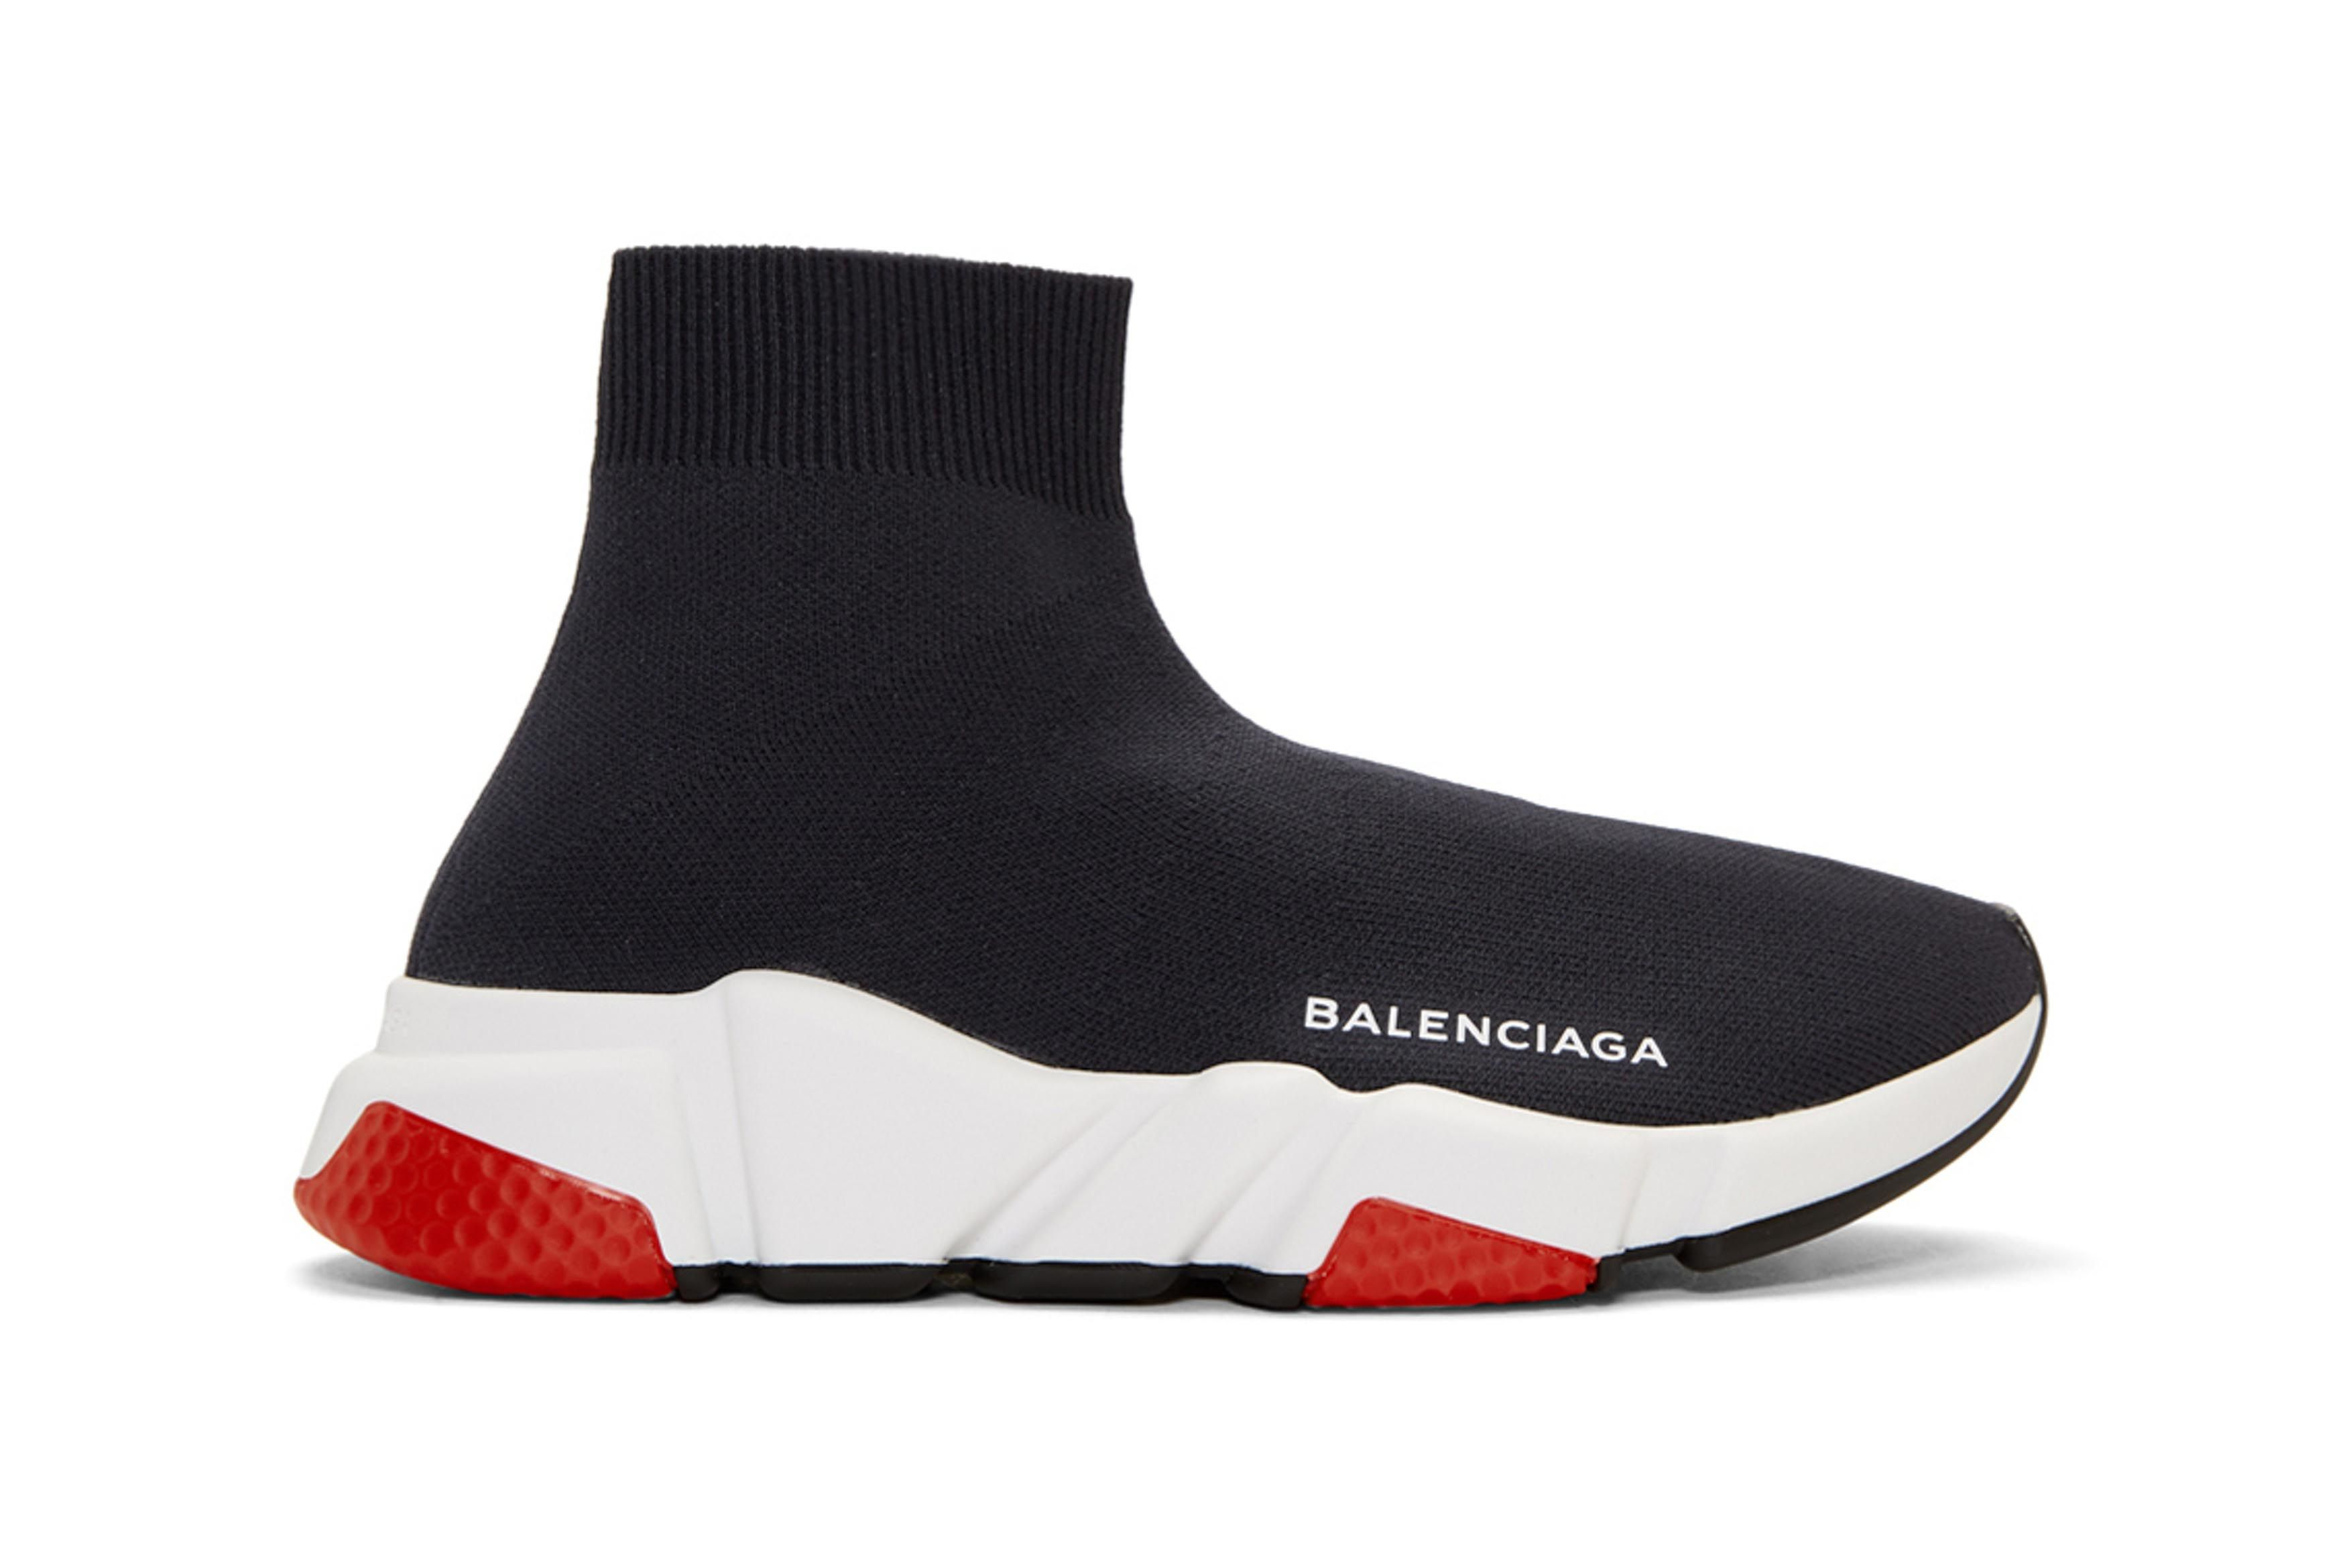 Balenciaga Speed Low High Top Sneakers Black Navy 3 Sneaker Freaker